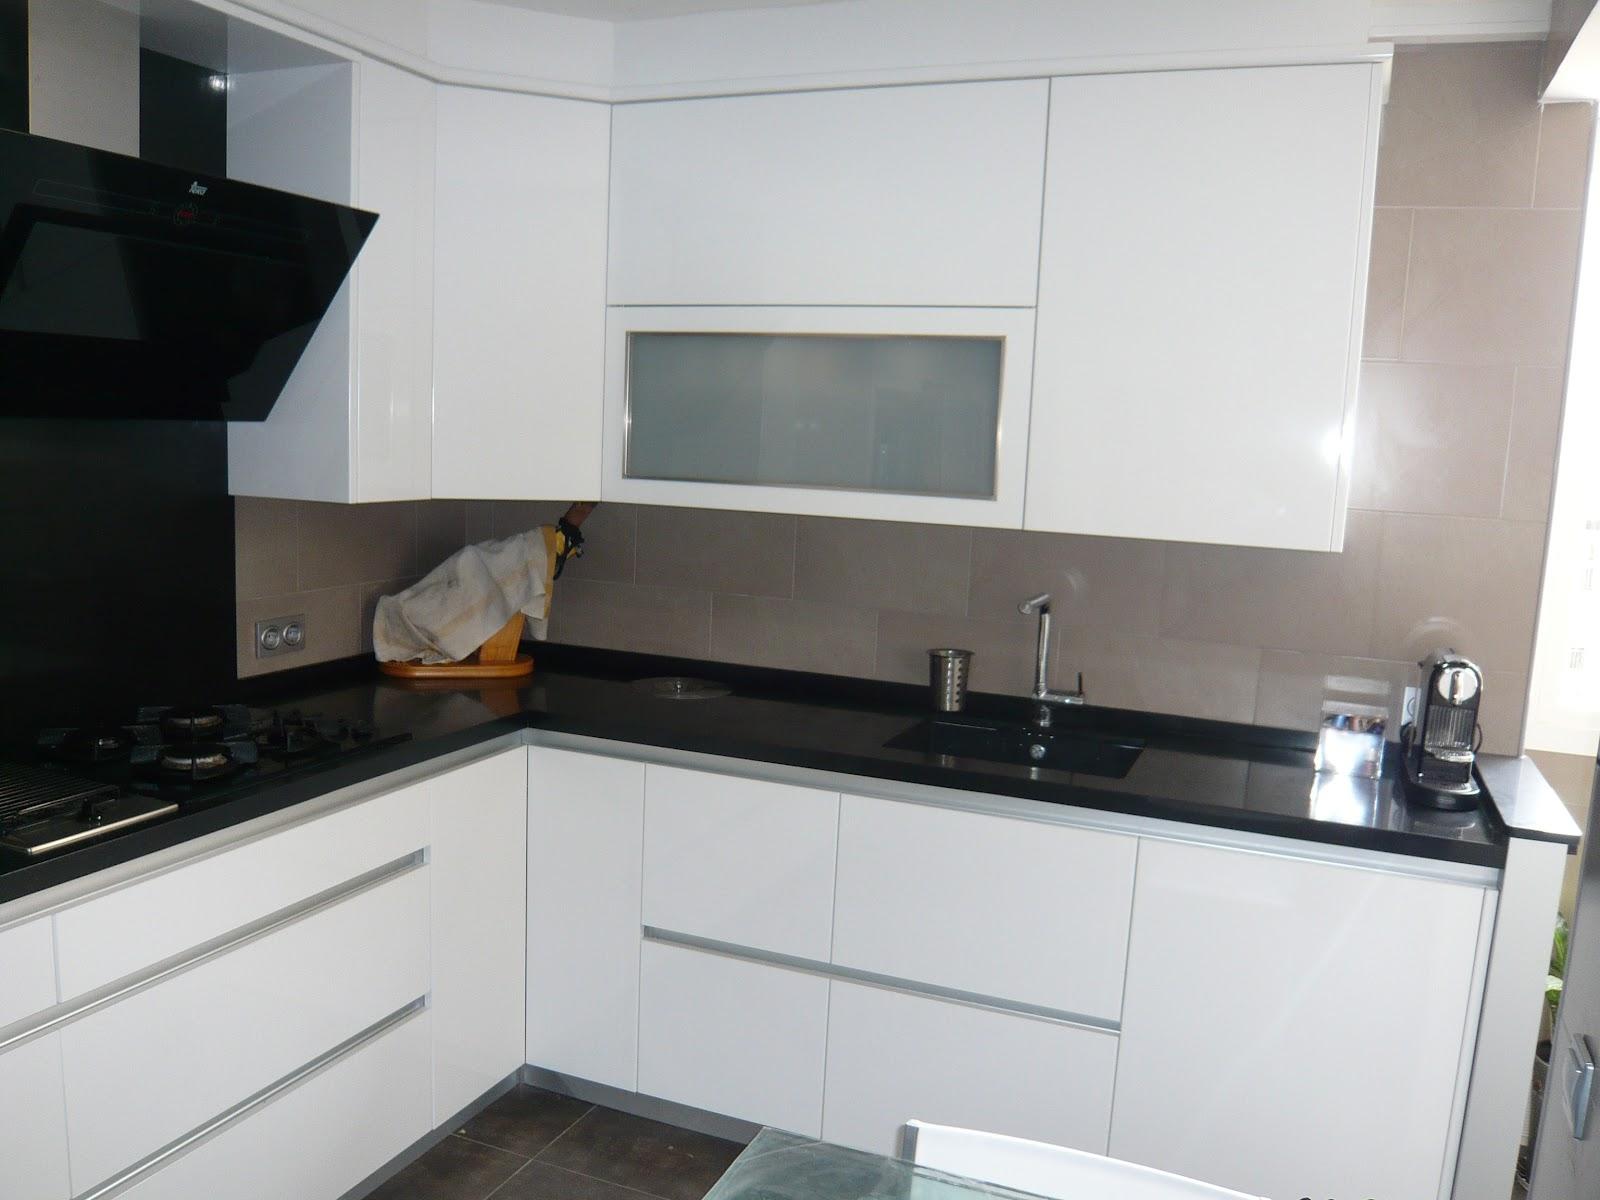 Reuscuina muebles de cocina blanco brillo sin tiradores - Azulejos cocina blanco brillo ...